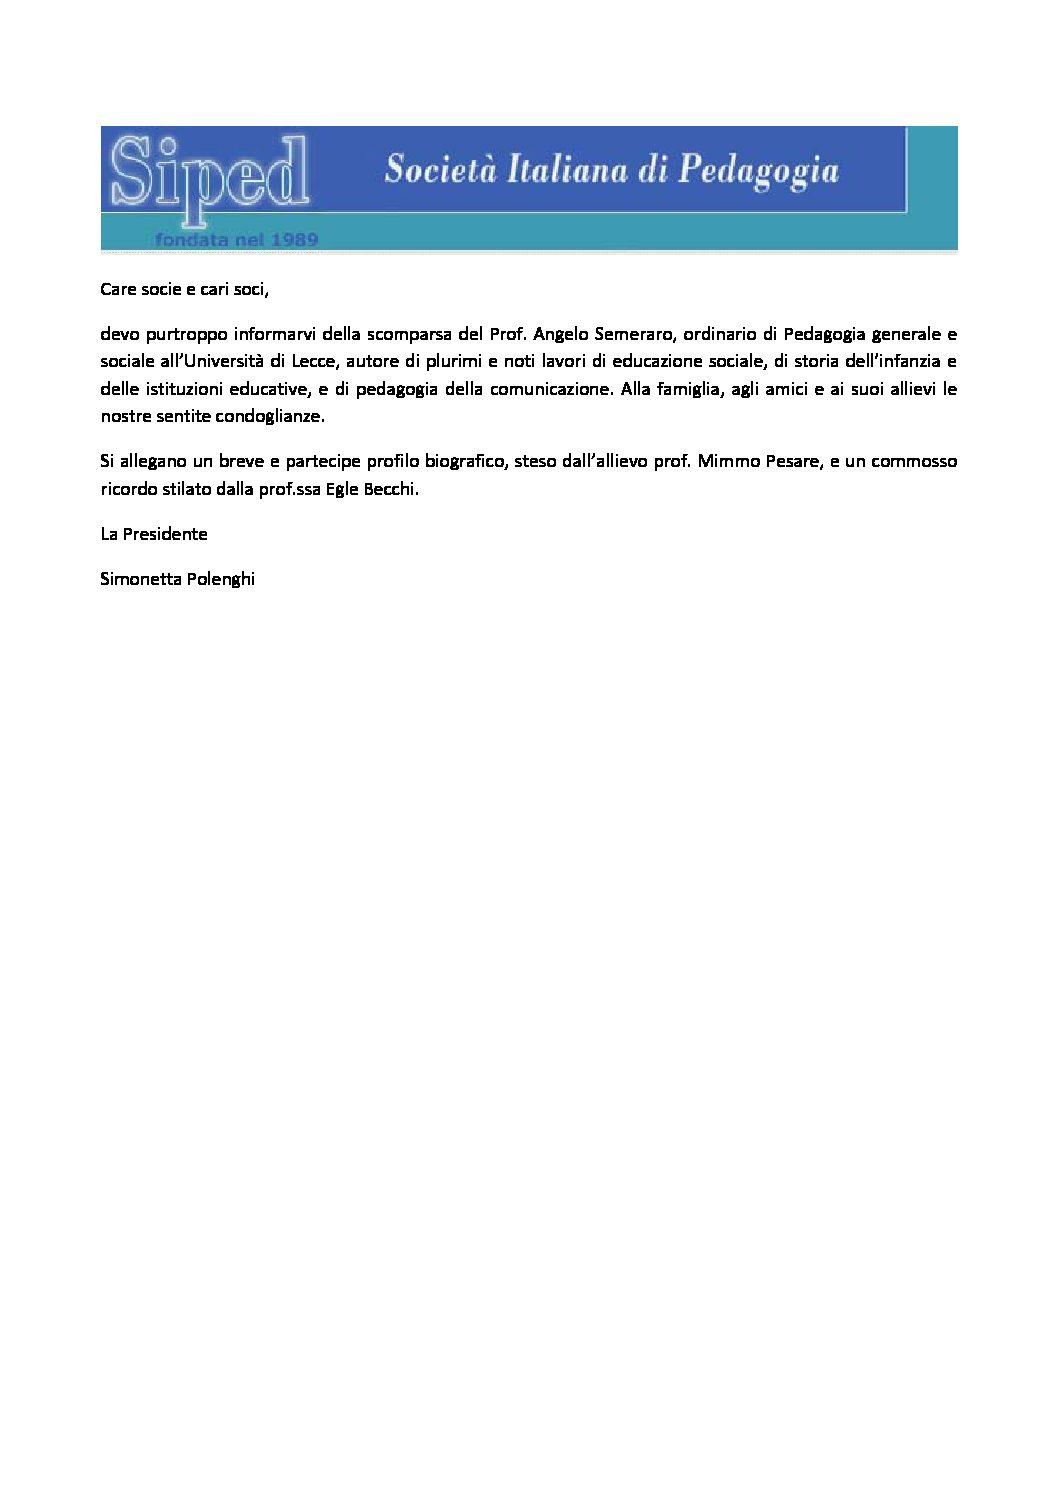 2018.05.16 – Scomparsa Prof. Angelo Semeraro